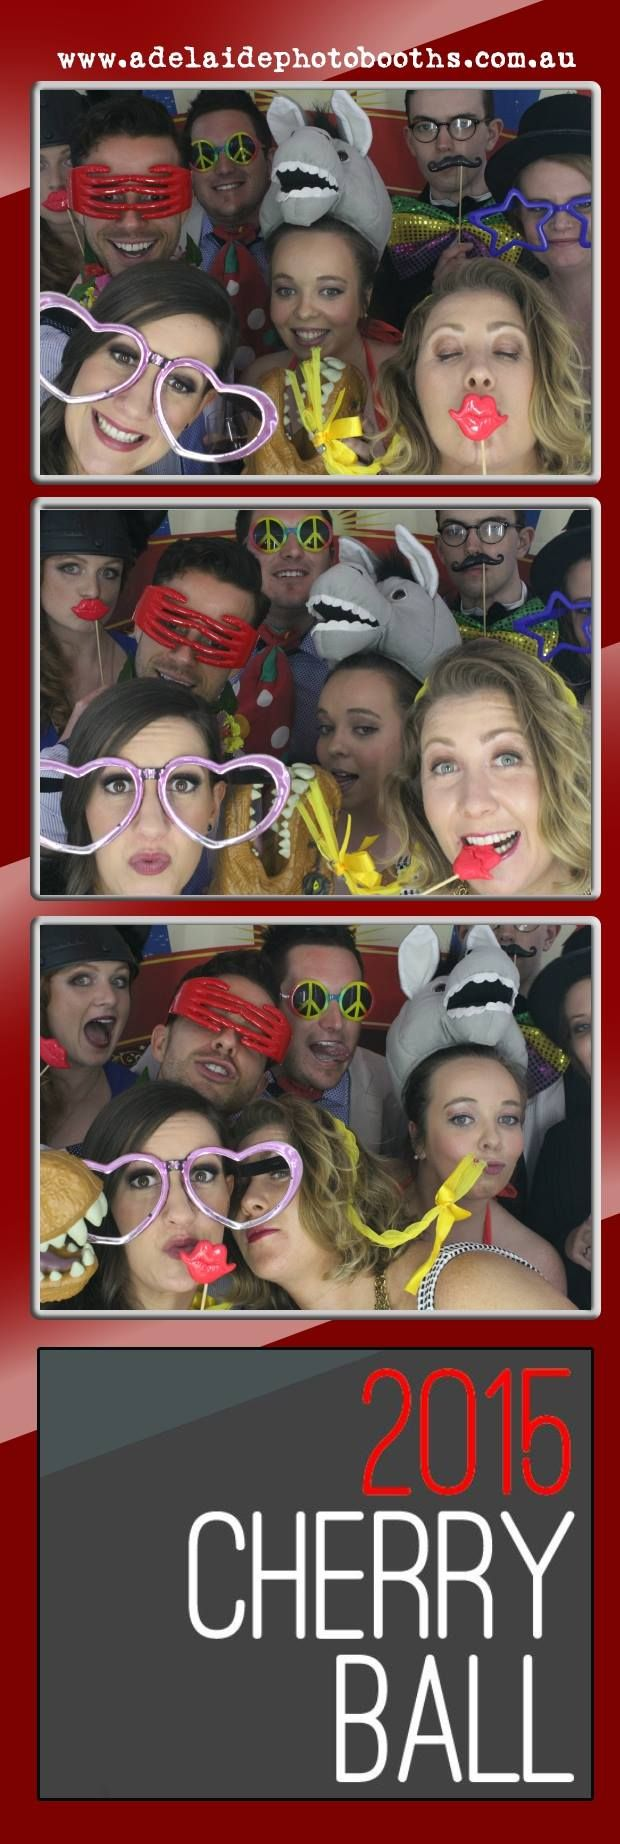 #cherryball2015 #adelaidephotobooths #photoboothsadelaide #ohsnap #3'sacrowd